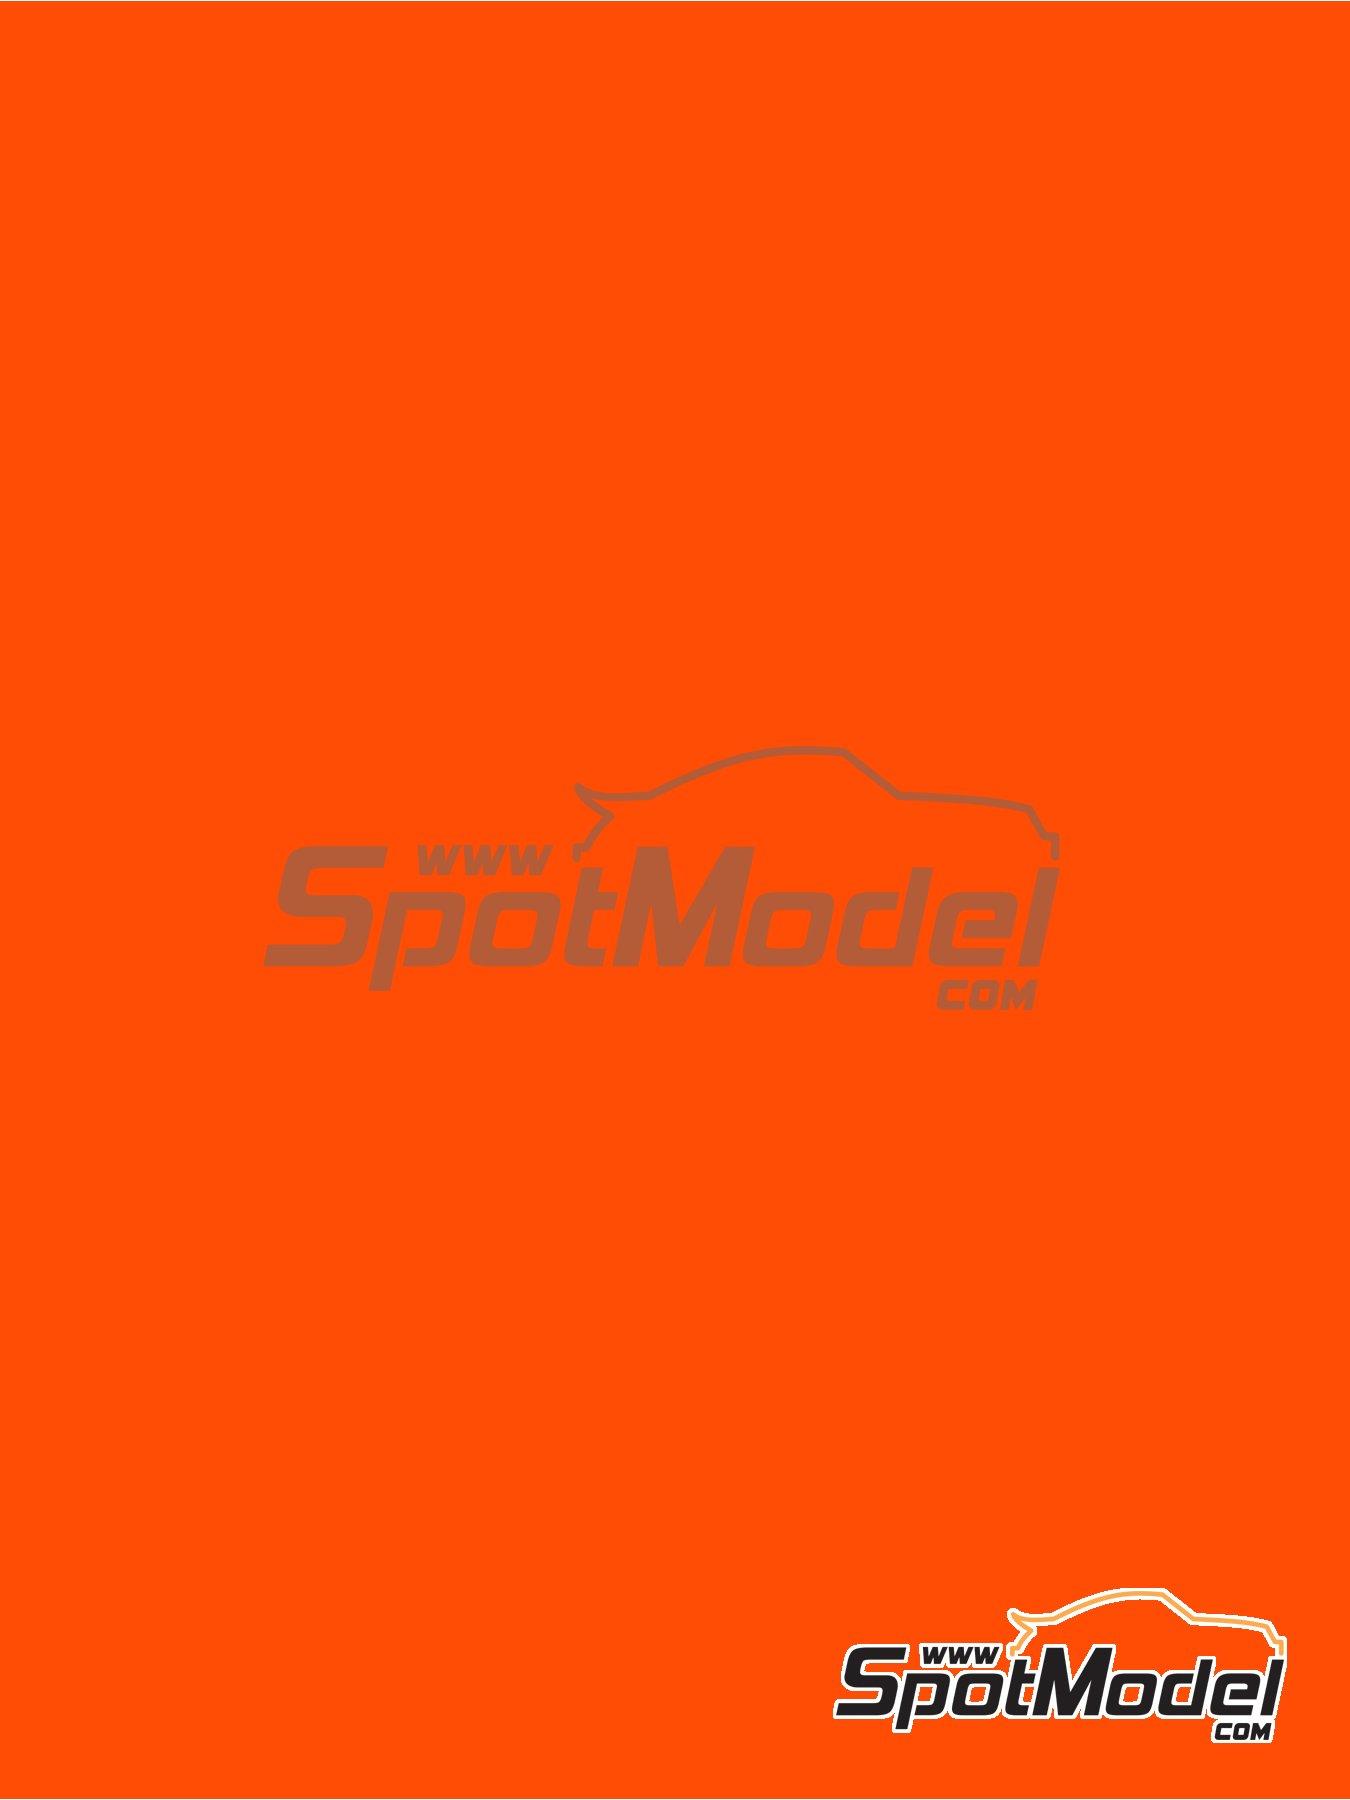 Naranja brillante - RAL2005 - Luminous orange - 1 x 60ml | Pintura fabricado por Zero Paints (ref.ZP-1033-RAL2005) image